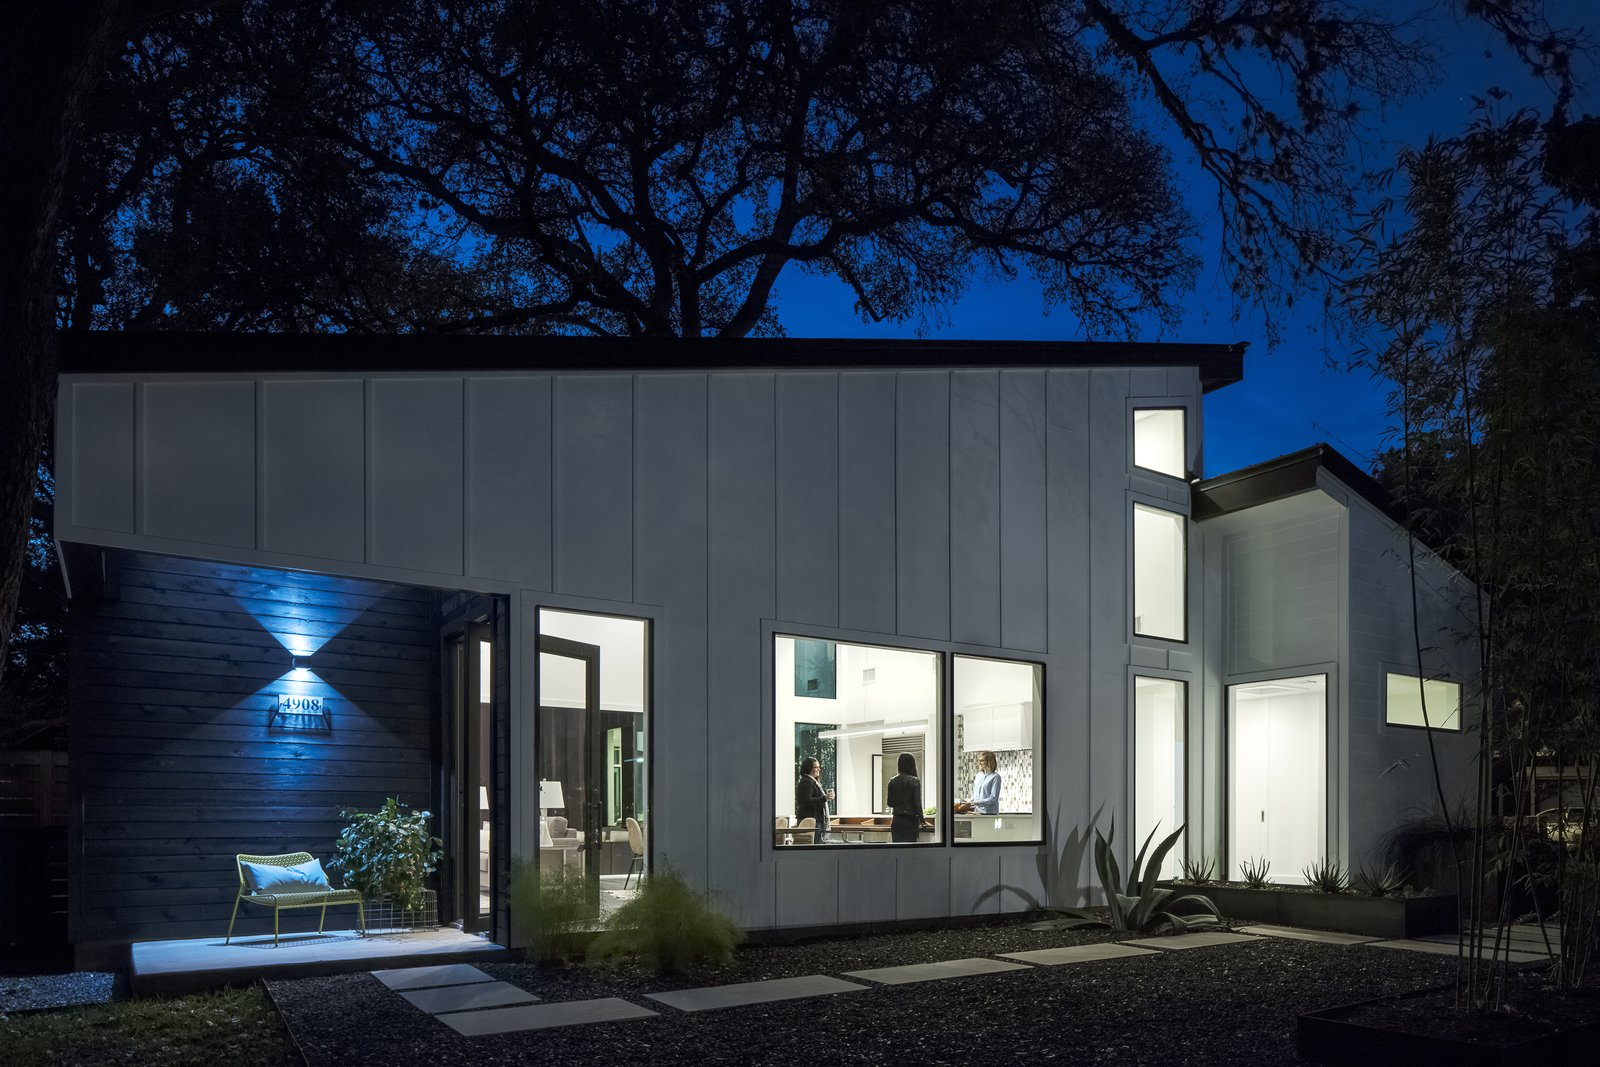 Strass Residence by Matt Fajkus Architecture | Photography: Atelier Wong Photography